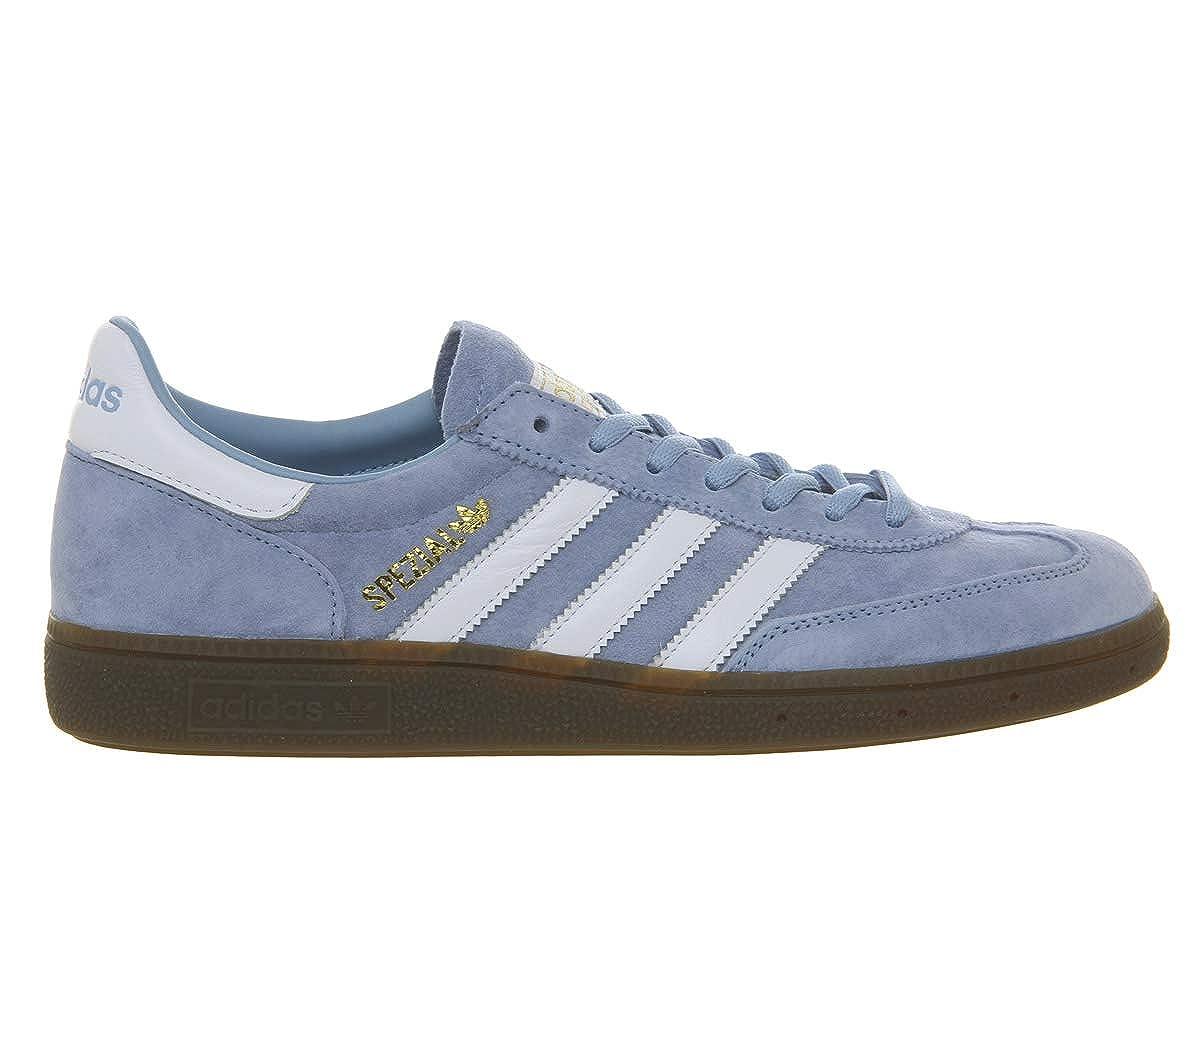 8bd8c73b90c adidas Men s Handball Spezial Fitness Shoes  Amazon.co.uk  Shoes   Bags